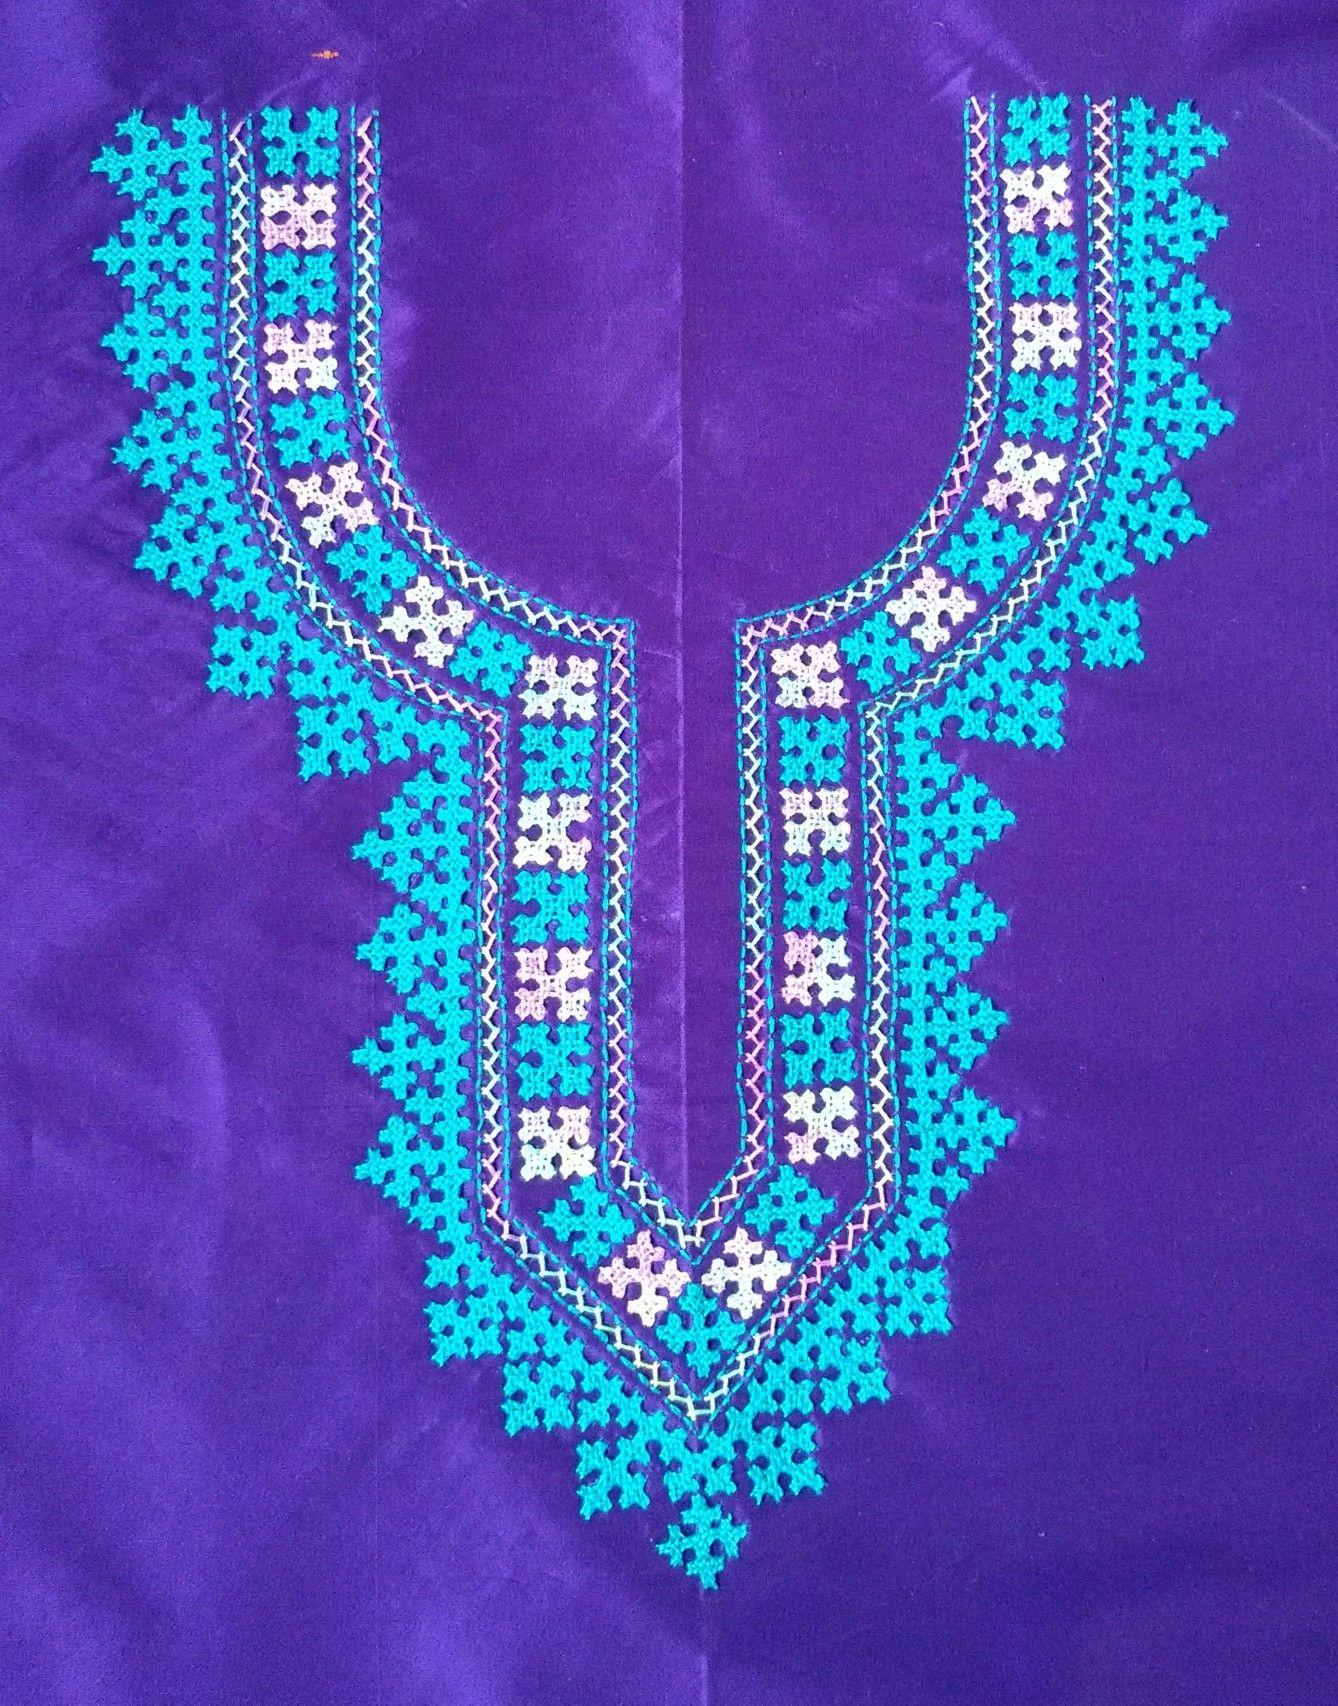 Pin By Lithium09 Lithium09 On Bordado Henna Designs Hand Kutch Work Designs Hand Embroidery Designs